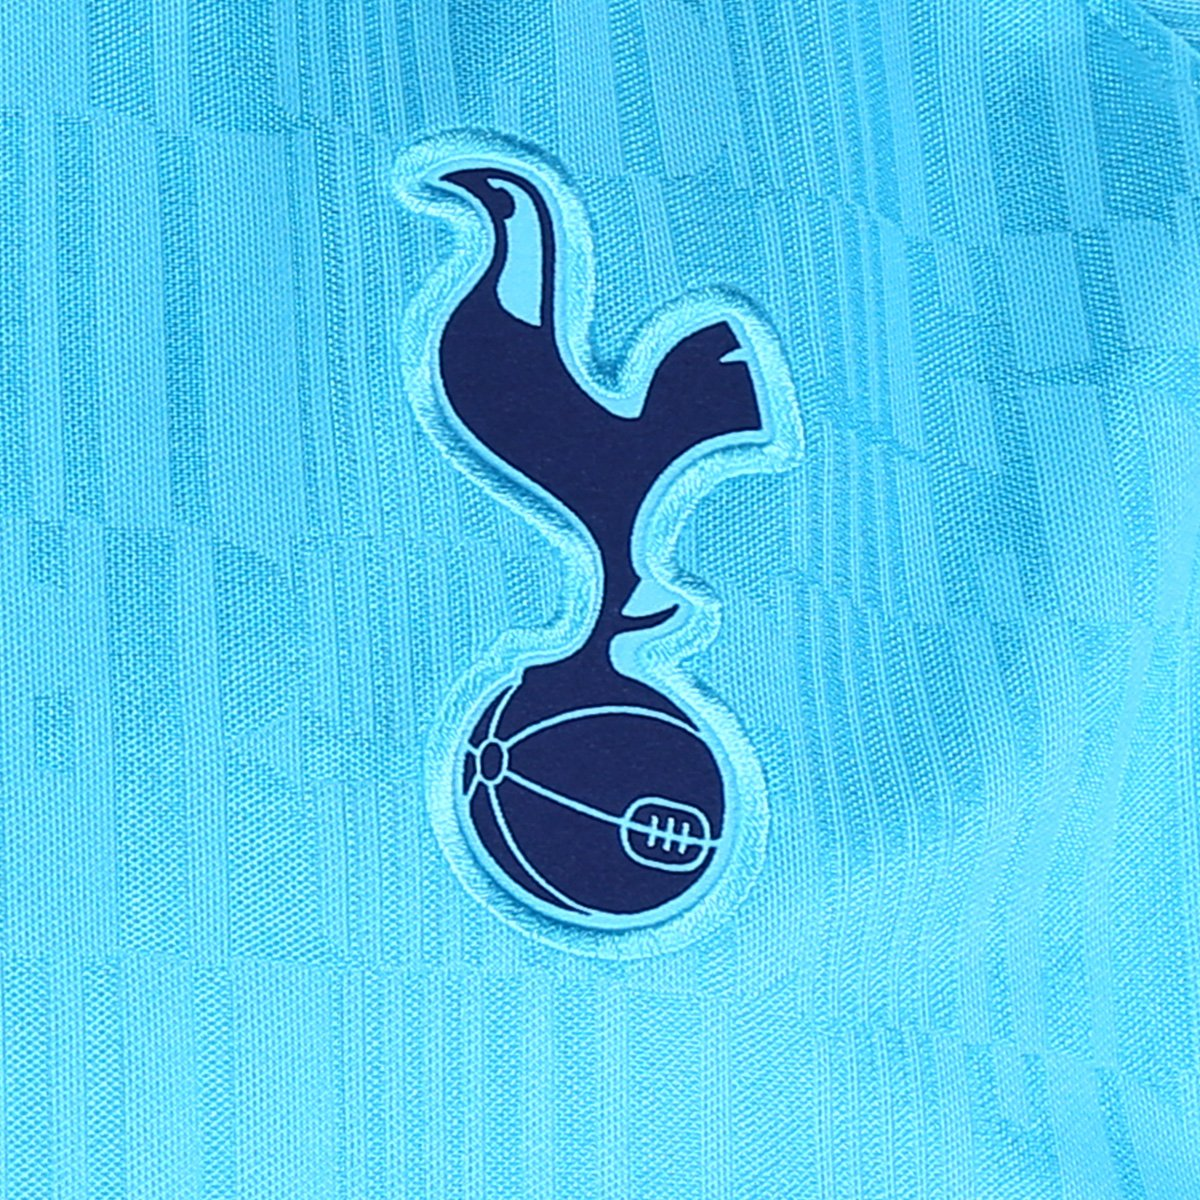 Camisa Tottenham Third 19 20 S Nº Torcedor Nike Masculina Netshoes